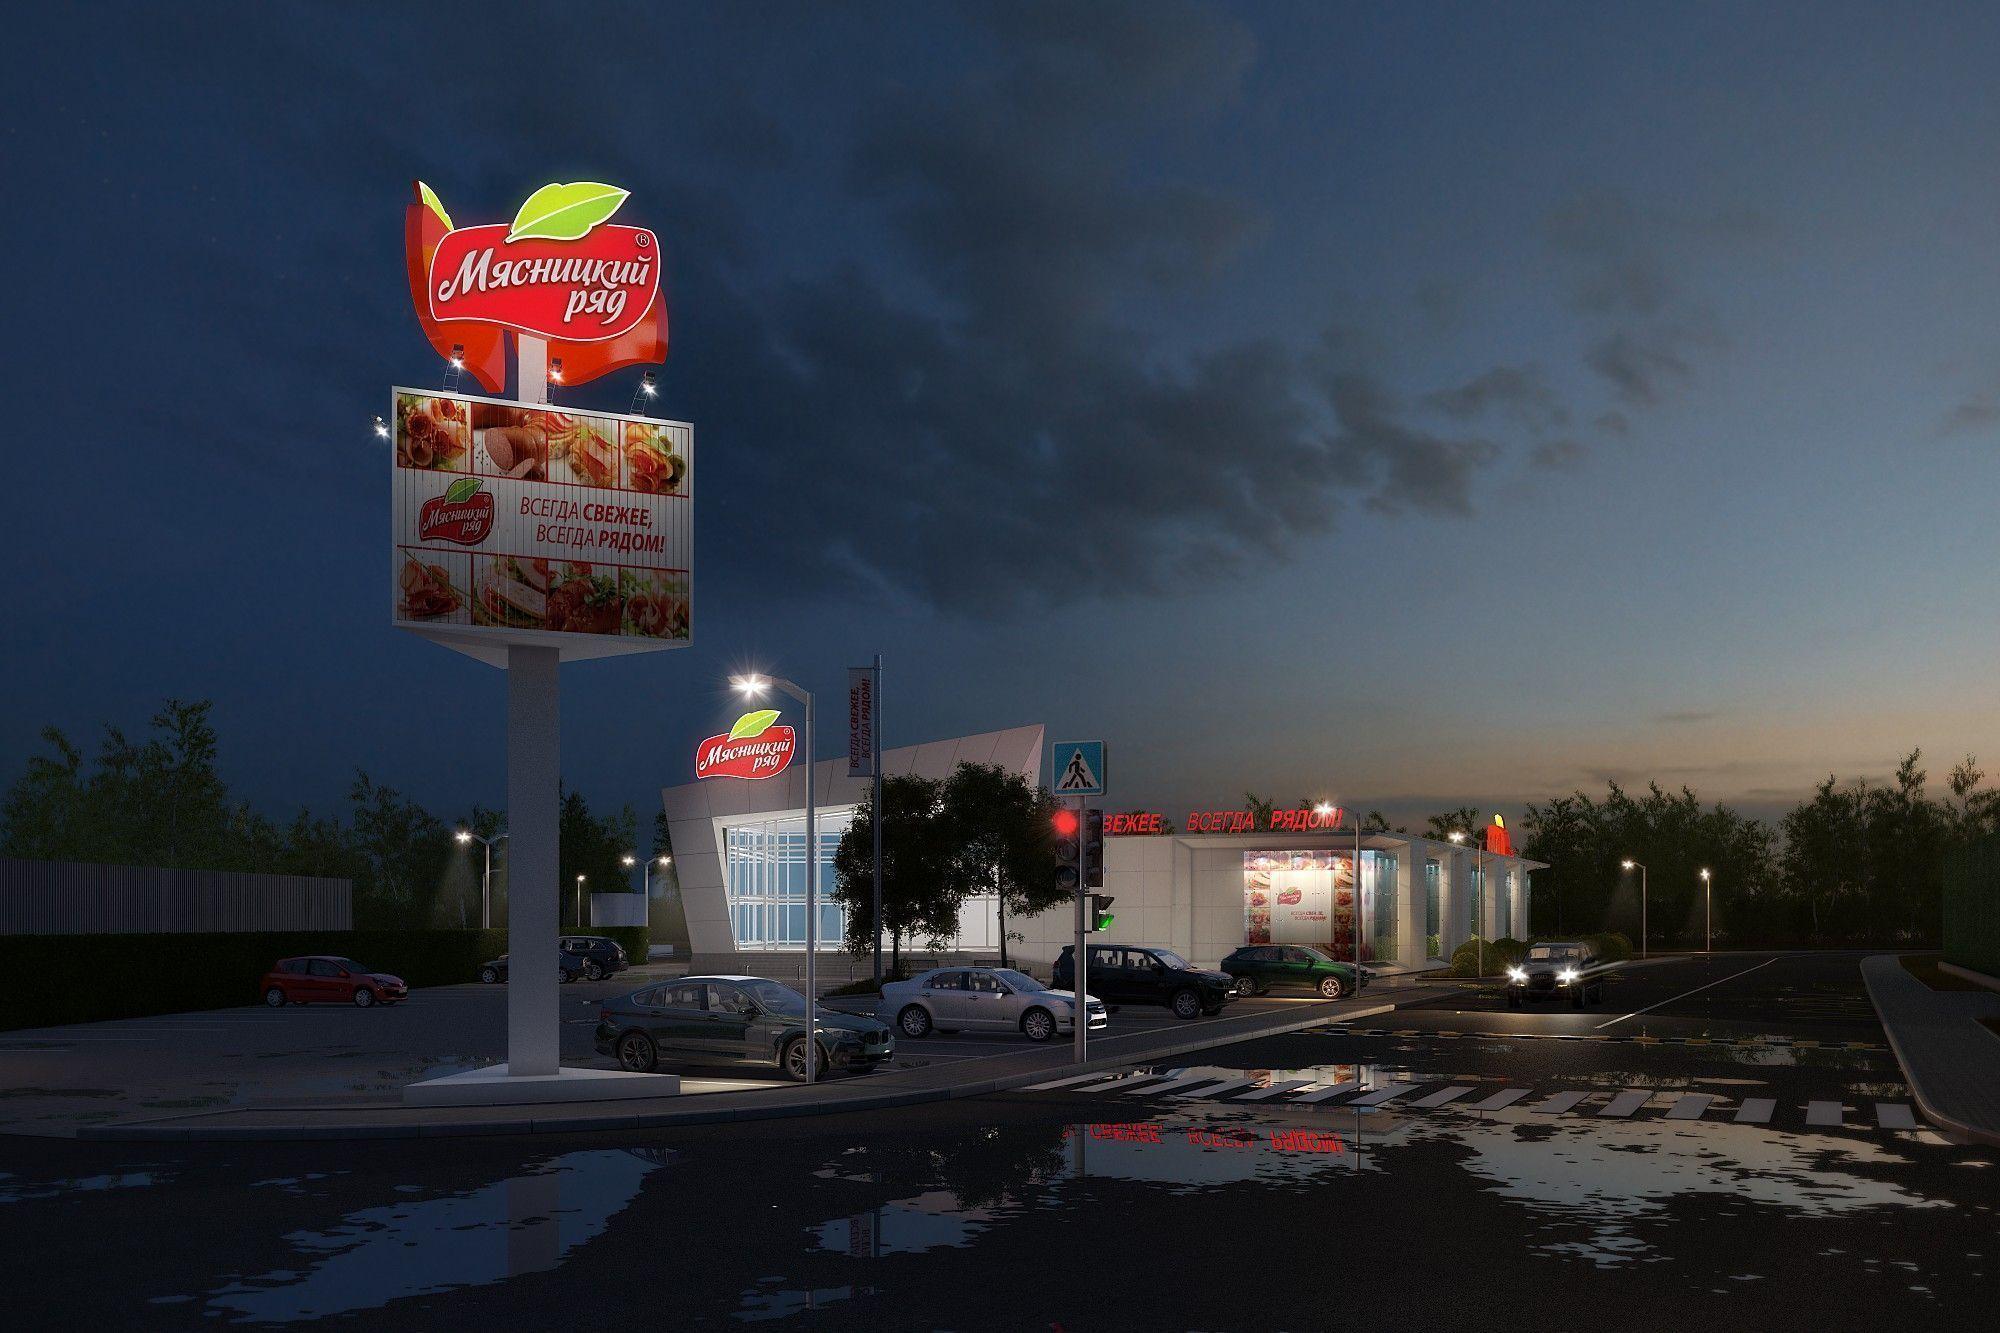 abbk_zavod_shop_exterior_v8_night_01